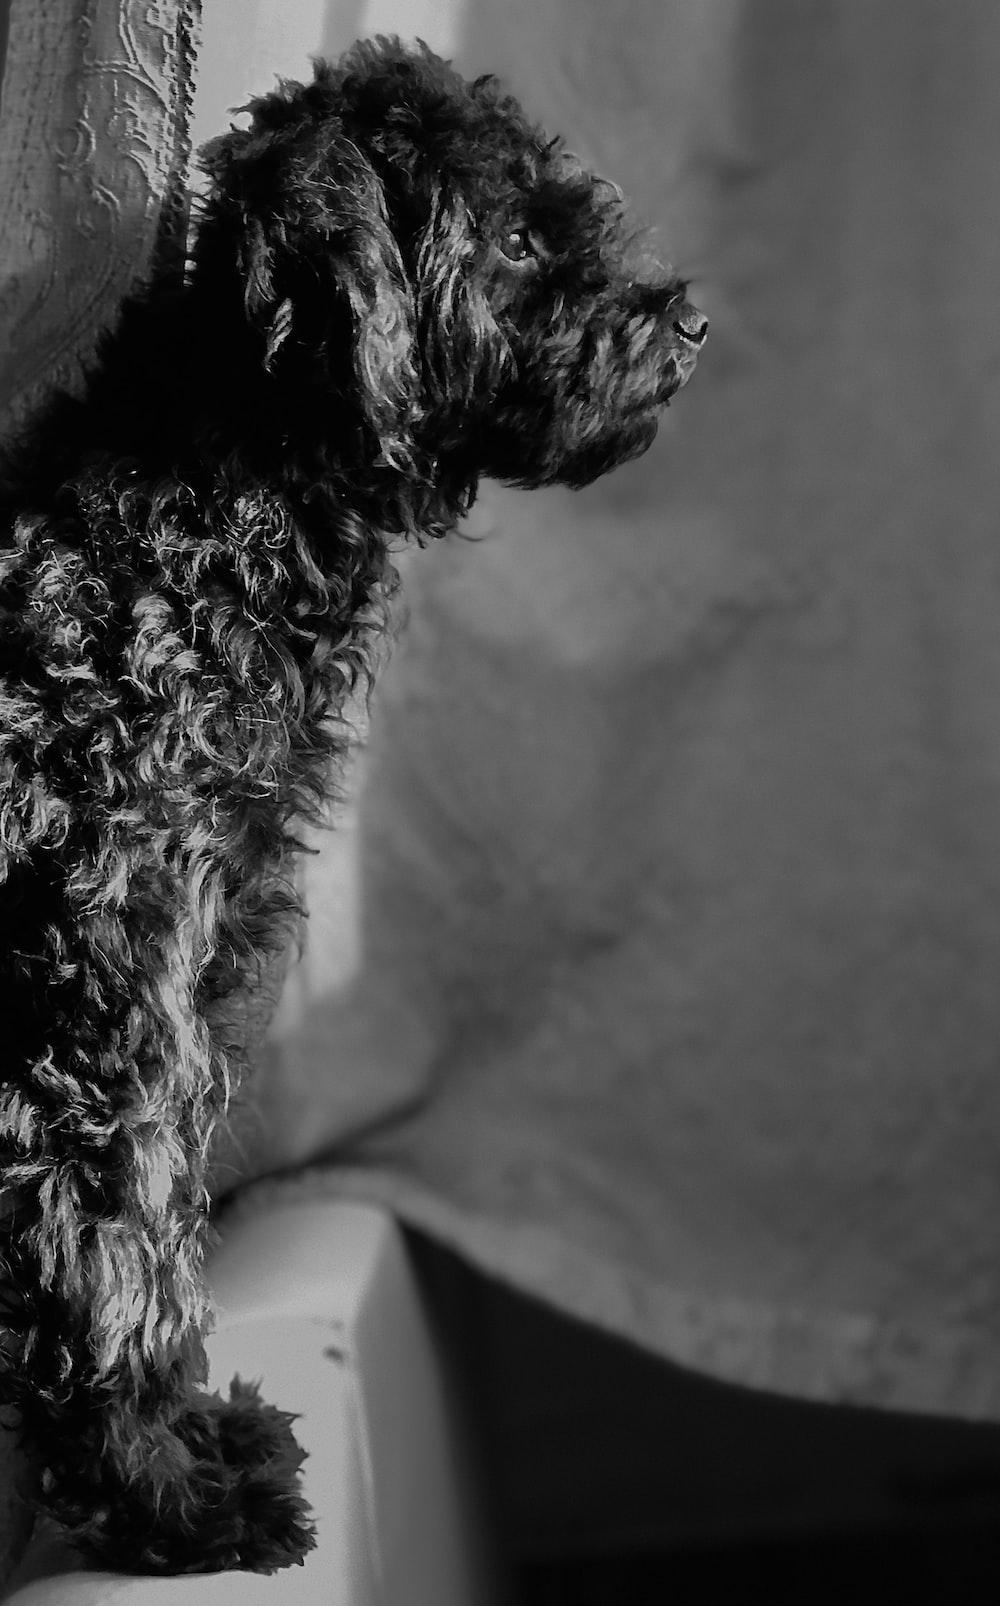 black and white long coat small dog